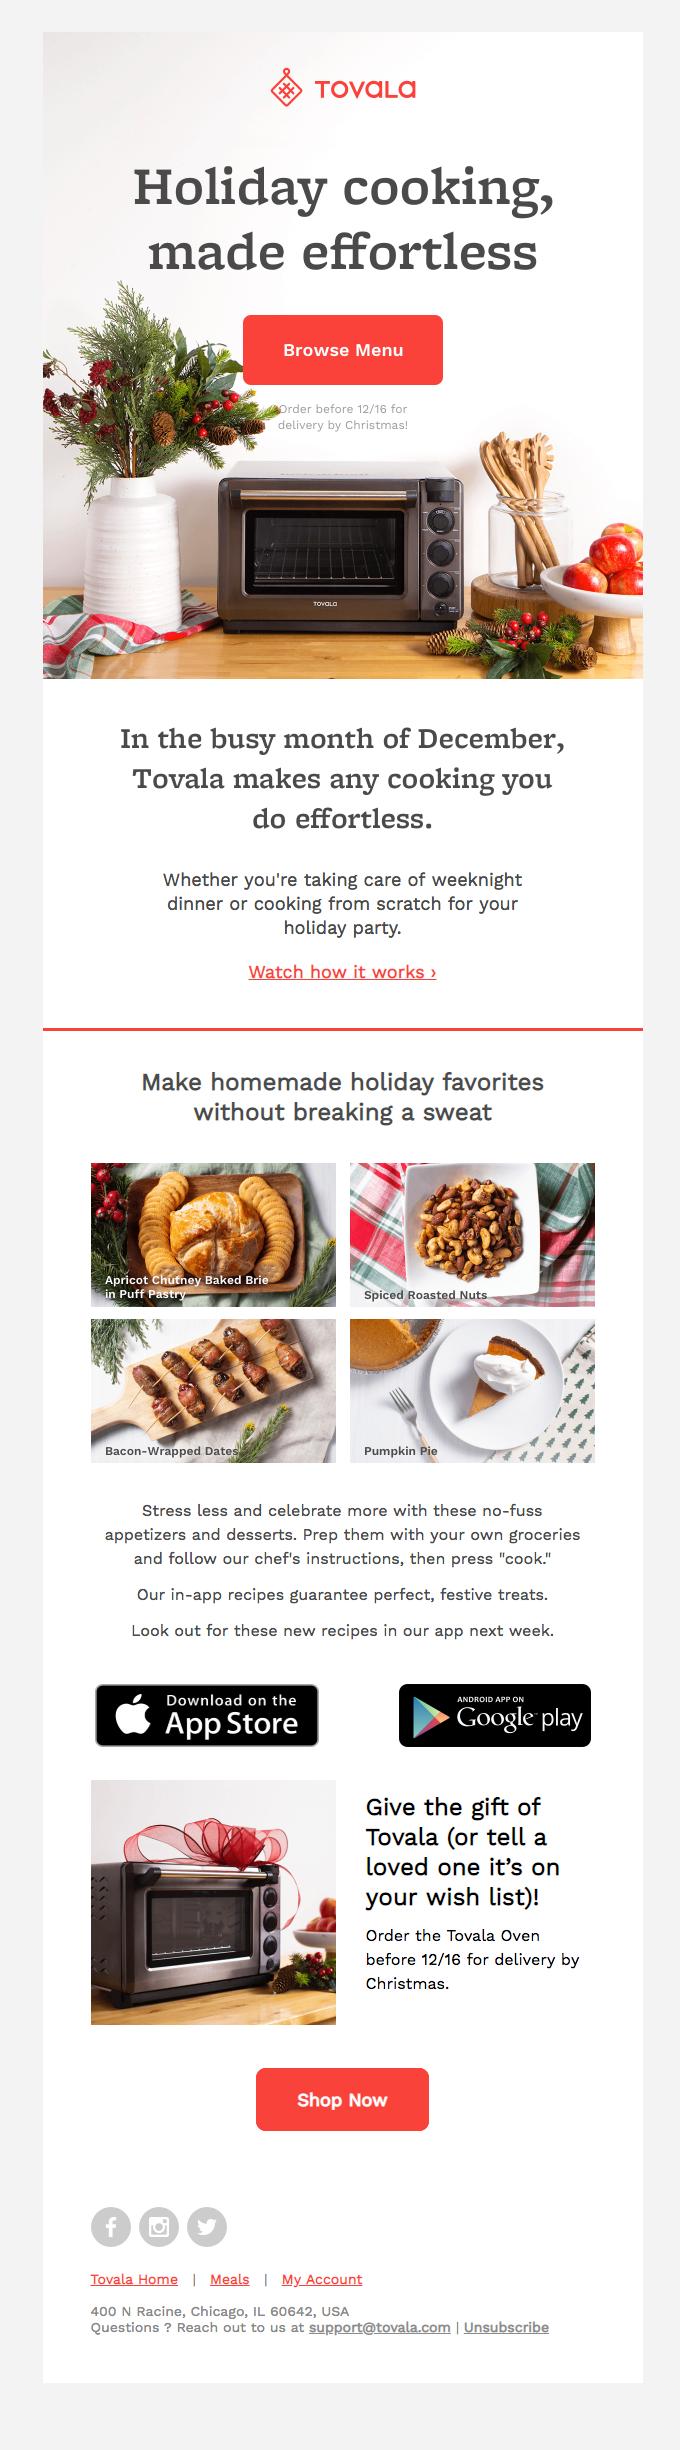 Stress Less. Celebrate More. 4+ Free Festive Recipes. 🎄